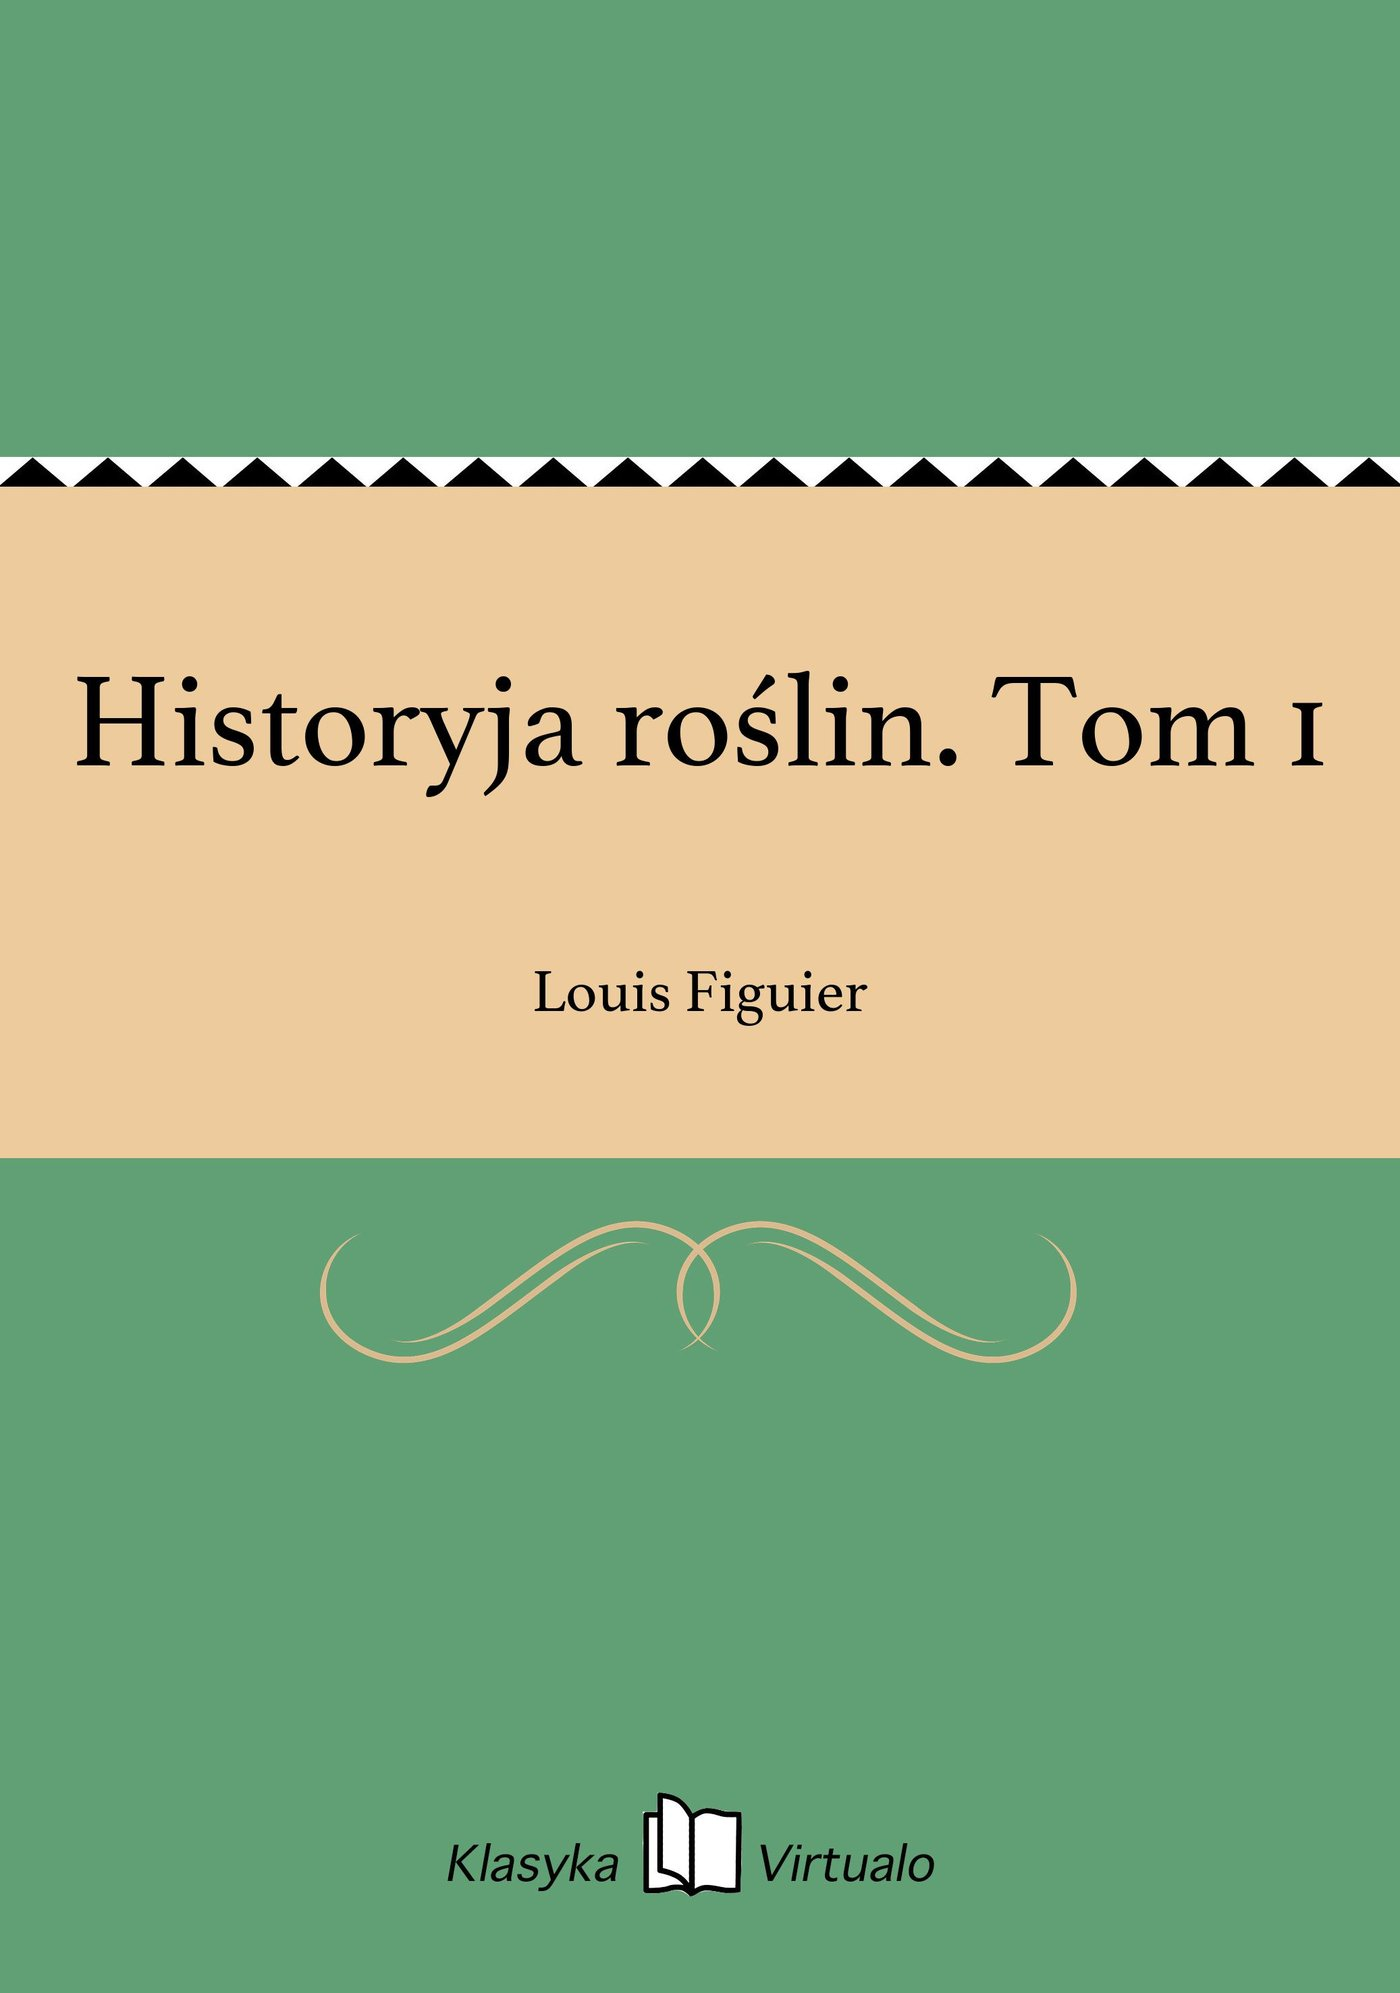 Historyja roślin. Tom 1 - Ebook (Książka EPUB) do pobrania w formacie EPUB